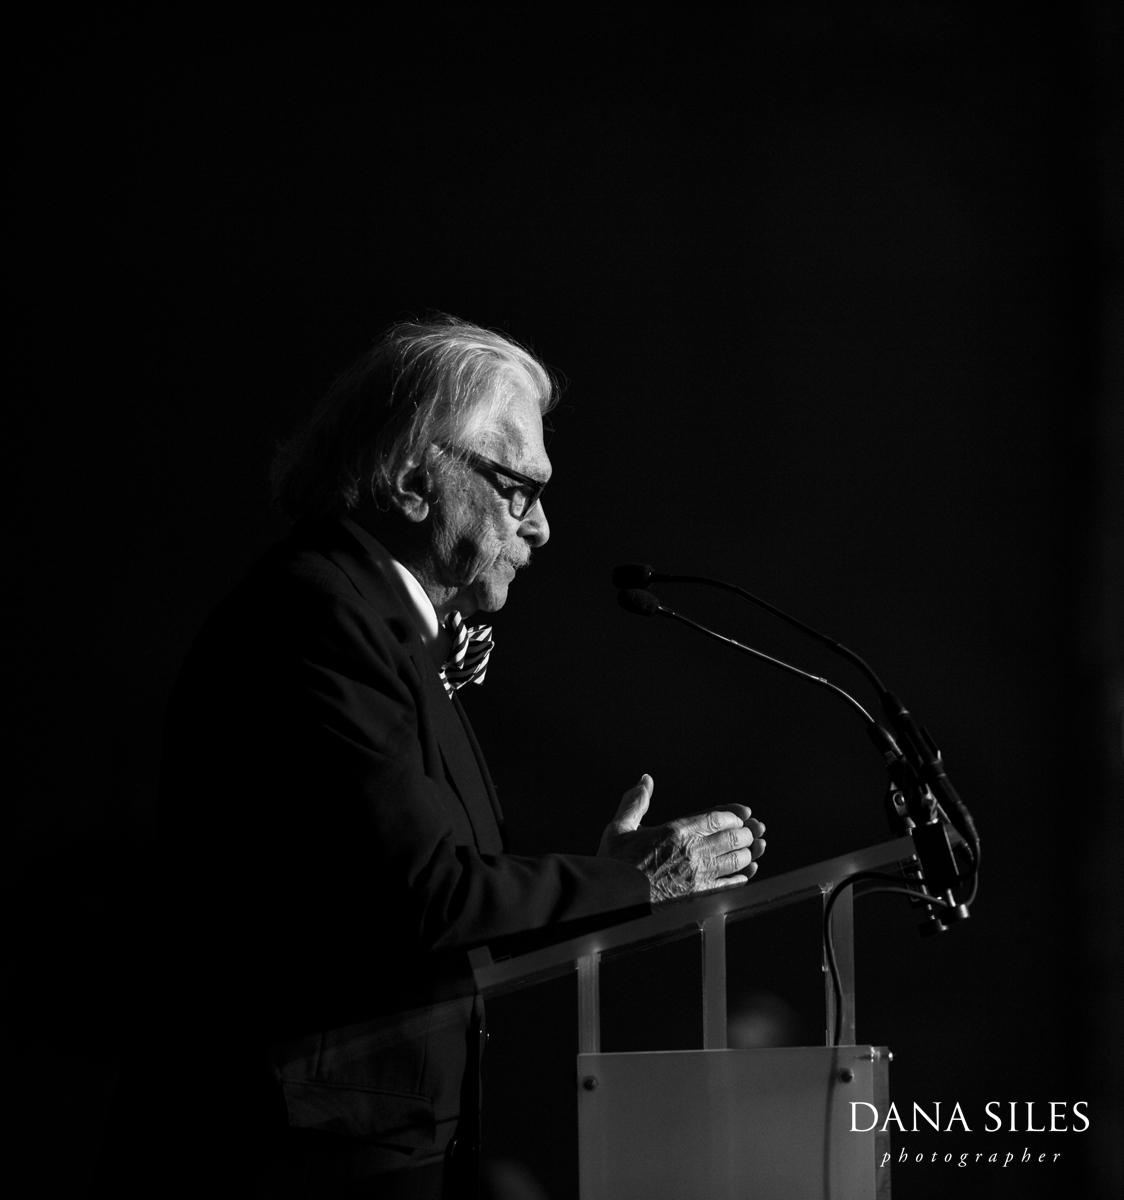 Pell-Awards-gala-dana-siles-photographer-morris-nathanson-19